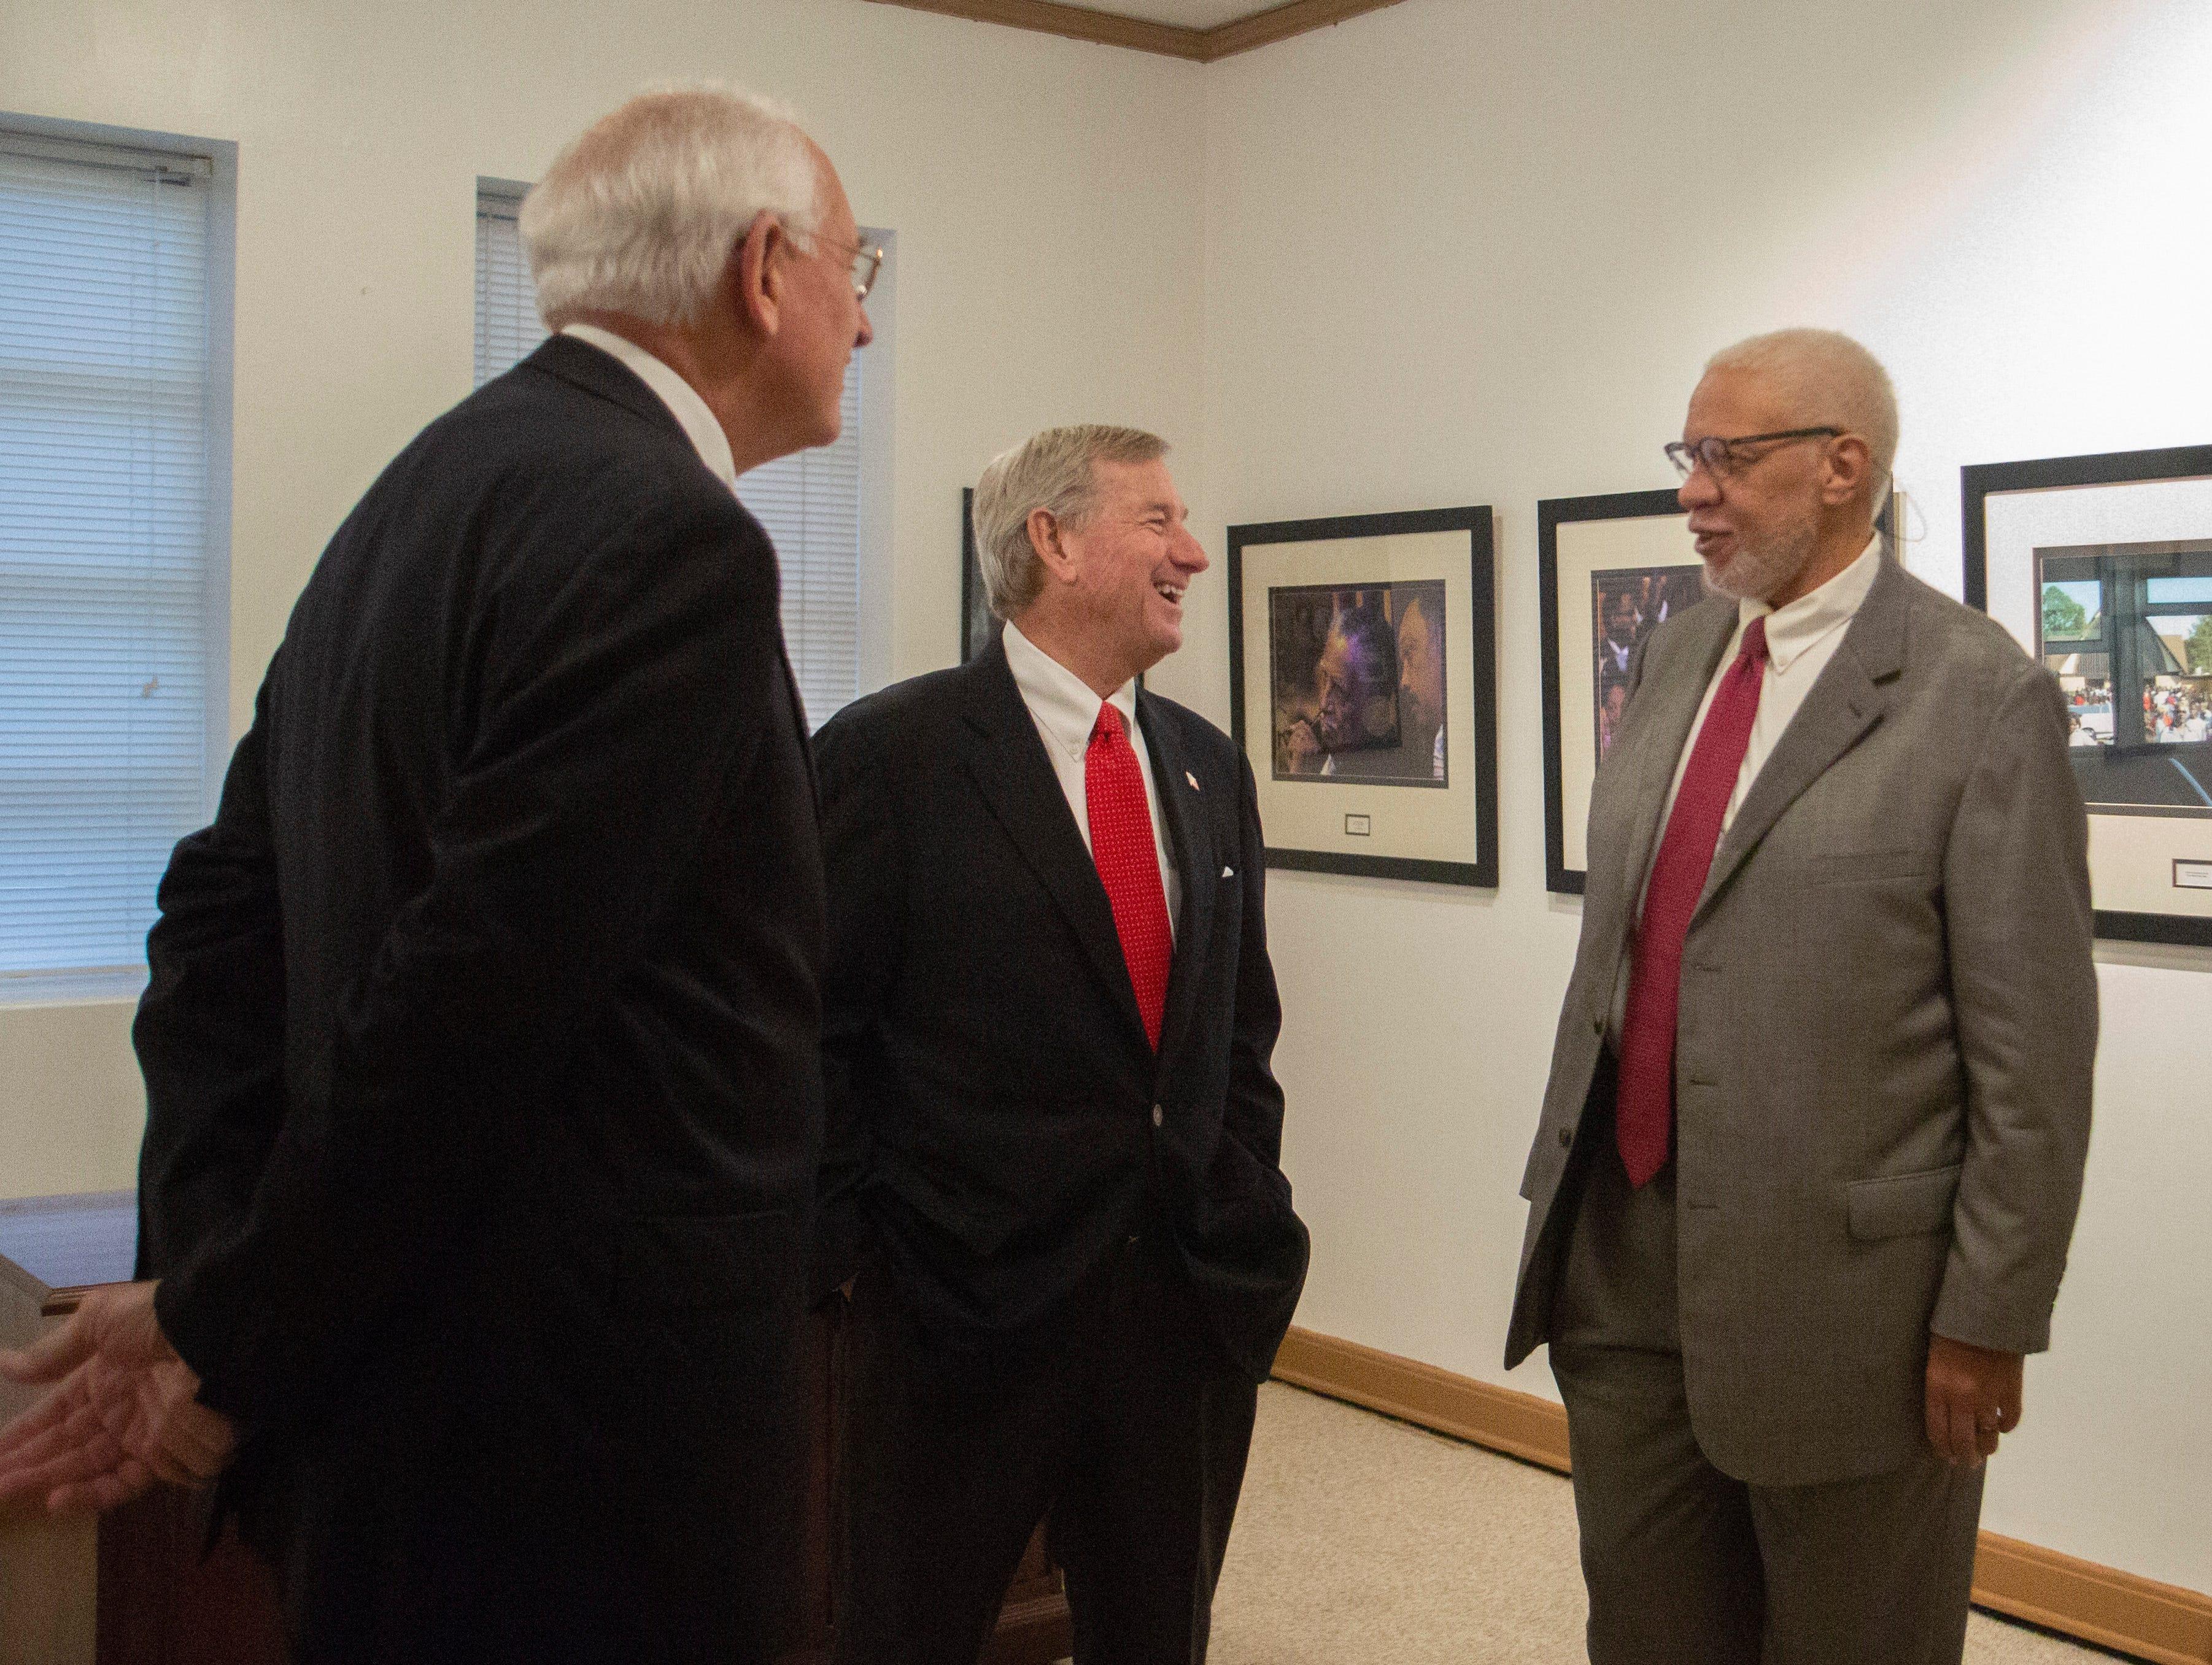 Montgomery Mayor Todd Strange talks with Lamar Higgins, a lobbyist who helped push legislation to designate a Rosa Parks Day.